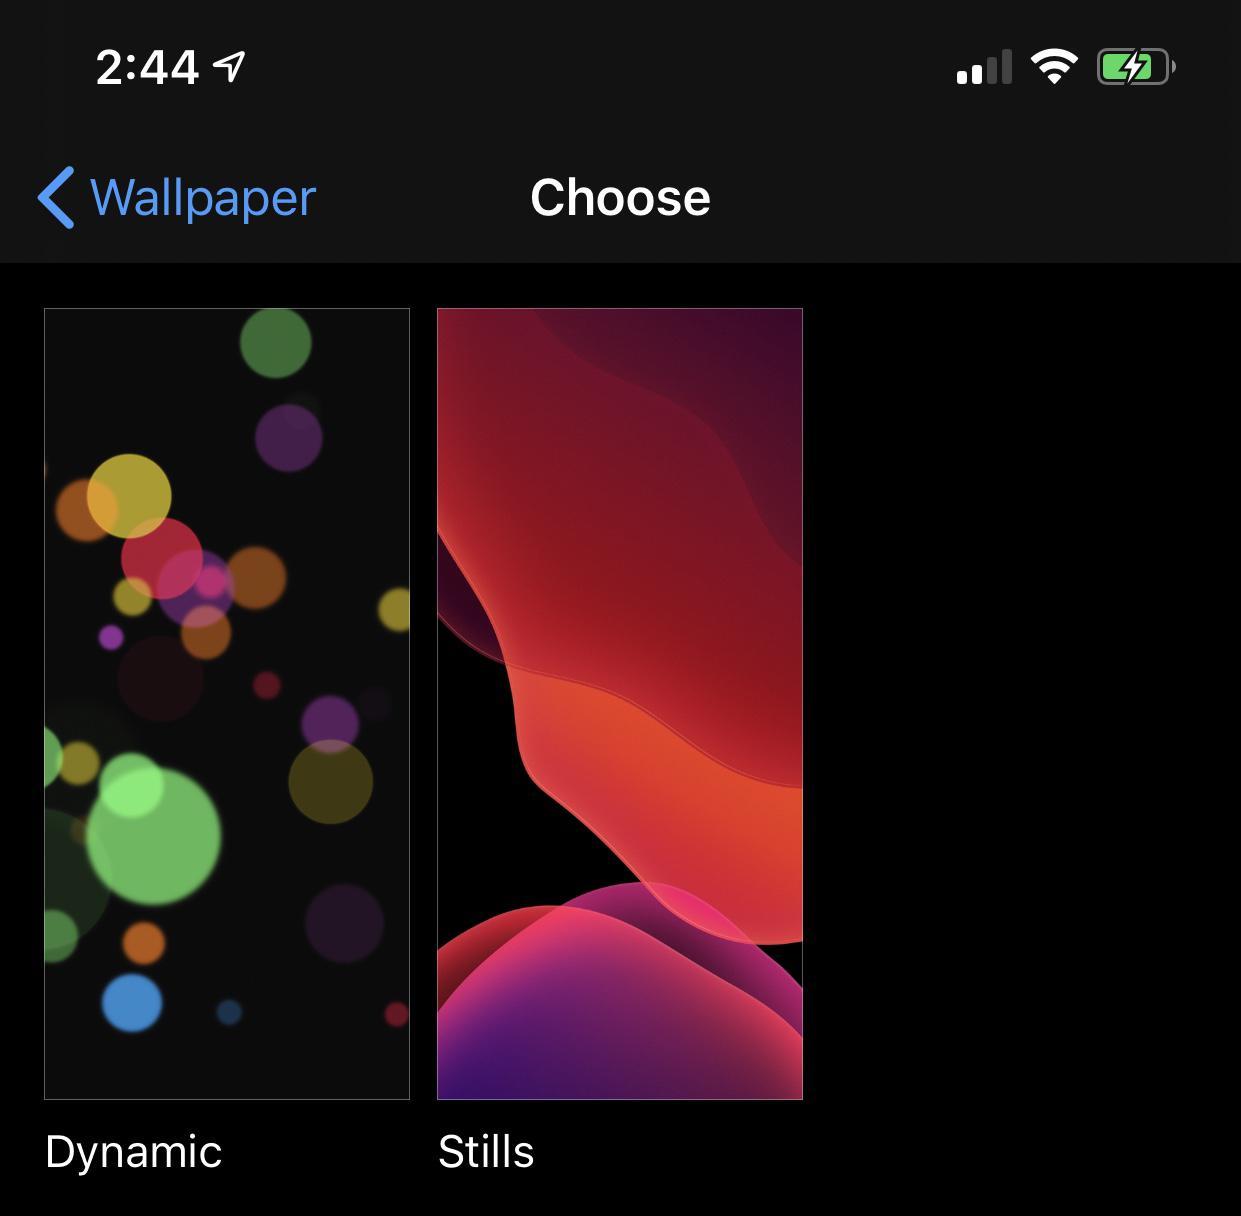 Iphone 11 Pro Max Screenshot 1241x1216 Download Hd Wallpaper Wallpapertip